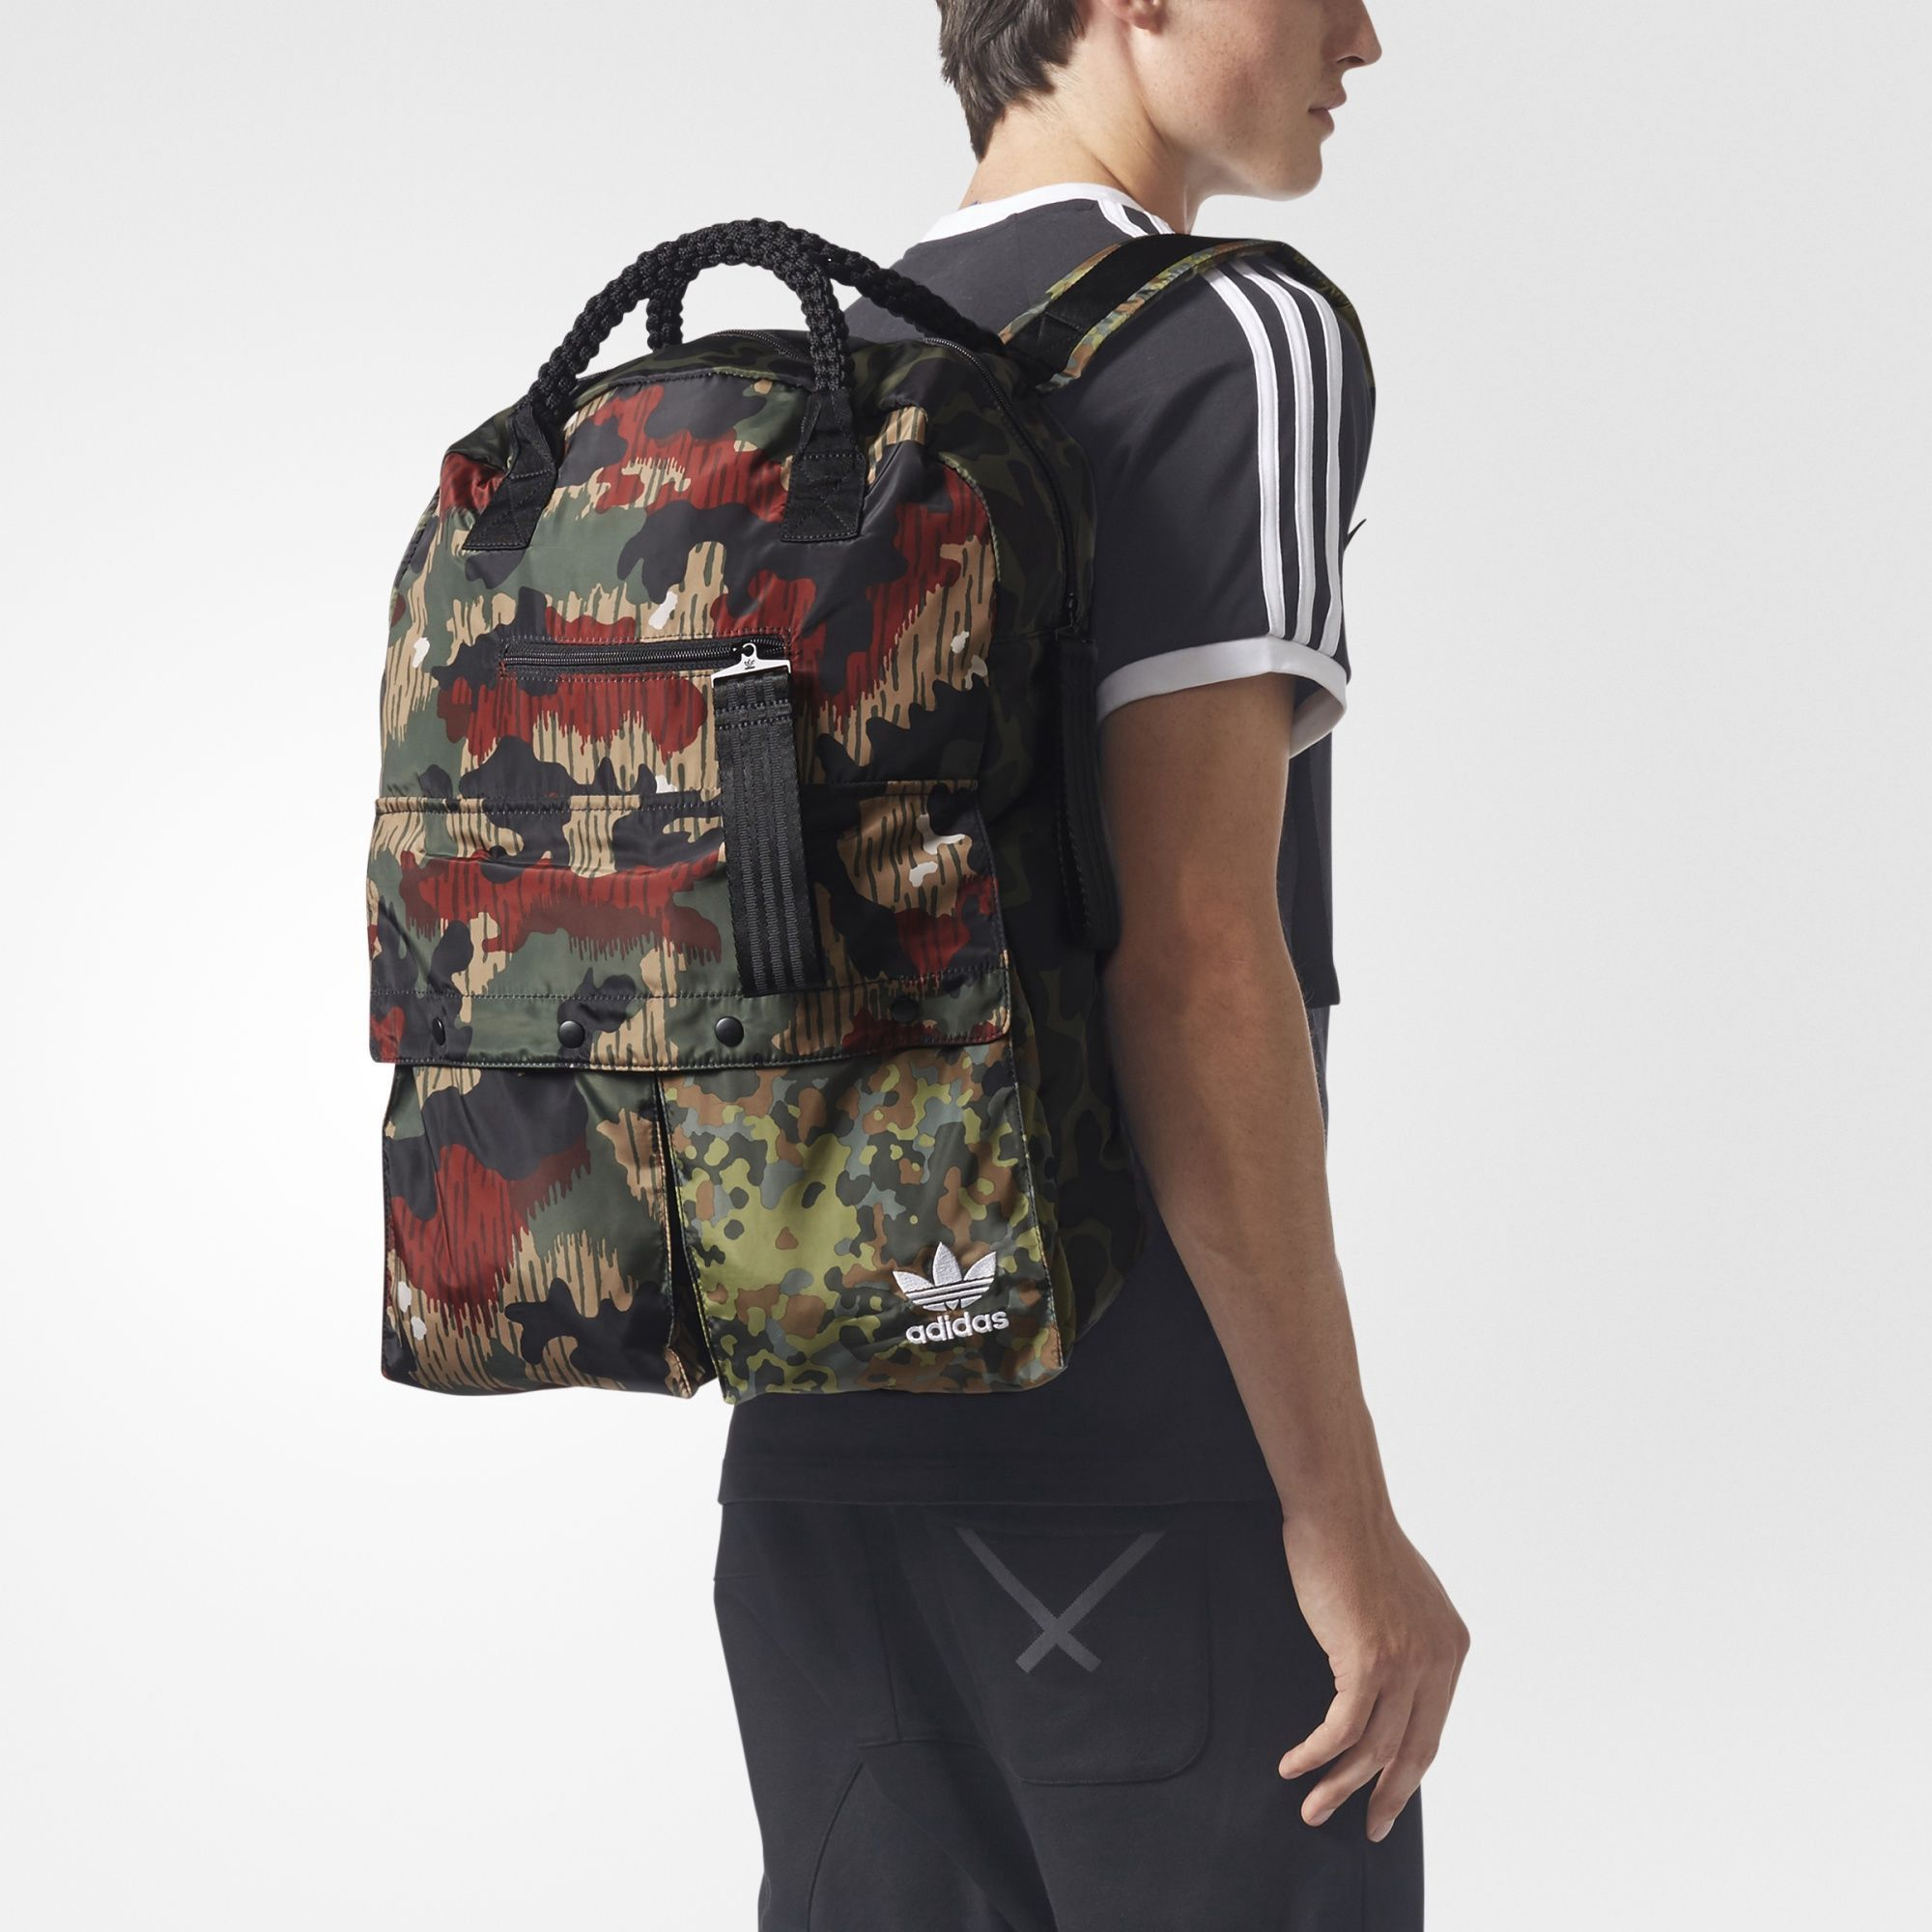 brand new cc84b 31e52 ADIDAS ORIGINALS Pharrell Williams Hu Hiking Backpack.  adidasoriginals   bags  backpacks